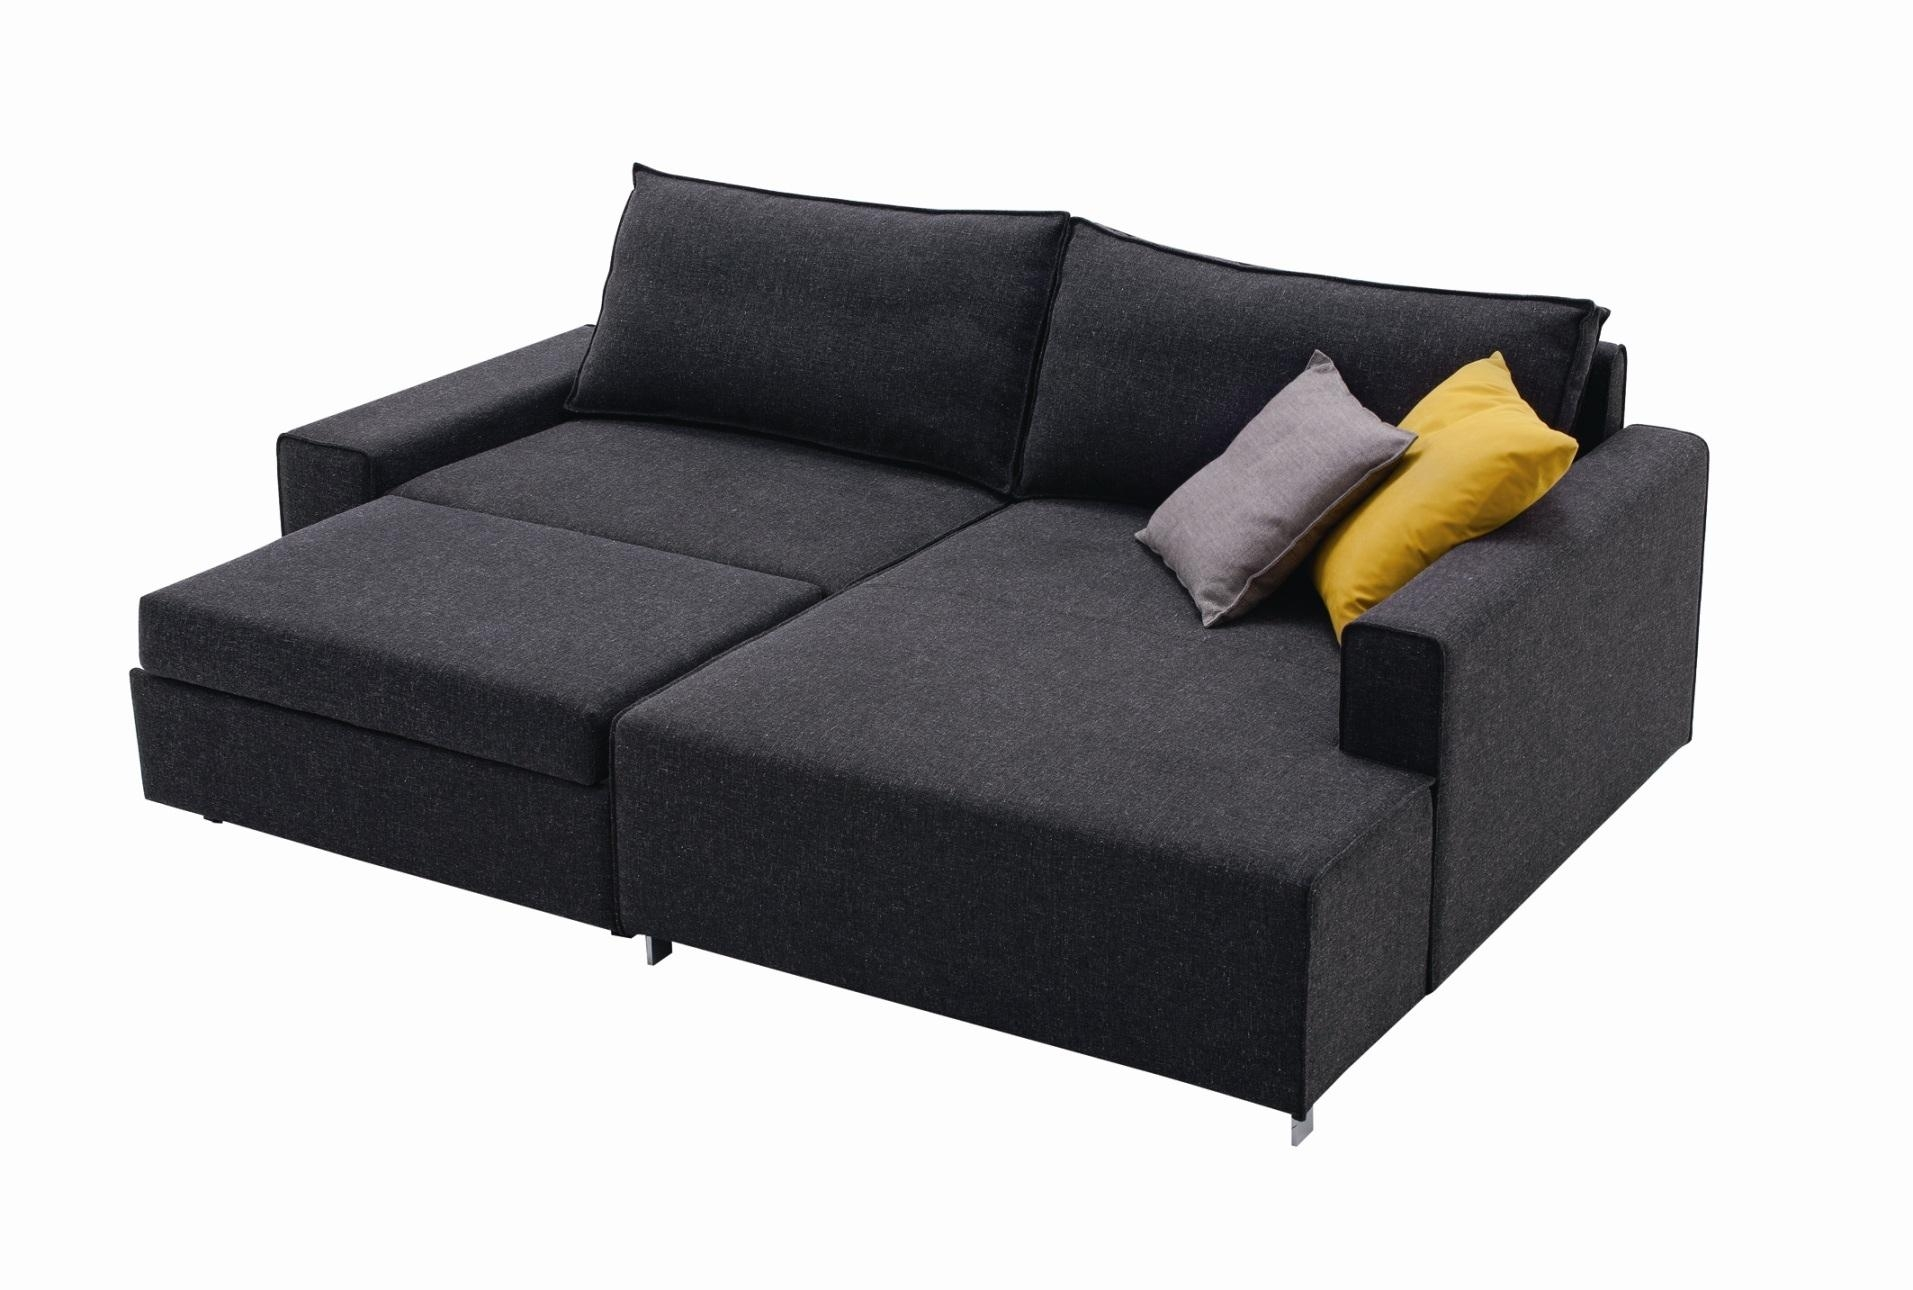 Furniture: Ikea Sectional | Ikea Futon | Ikea Sofa Sleeper With Regard To Mini Sofa Beds (Image 4 of 20)